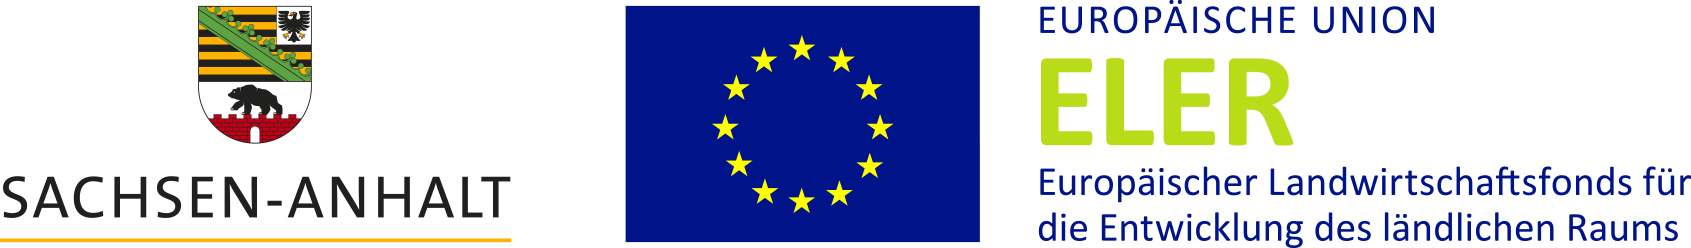 https://europa.sachsen-anhalt.de/fileadmin/Bibliothek/Politik_und_Verwaltung/StK/Europa/ESI-Fonds-Neu_2017/Bilder/Logos/ELER/ELER_signetpaar_rgb.jpg